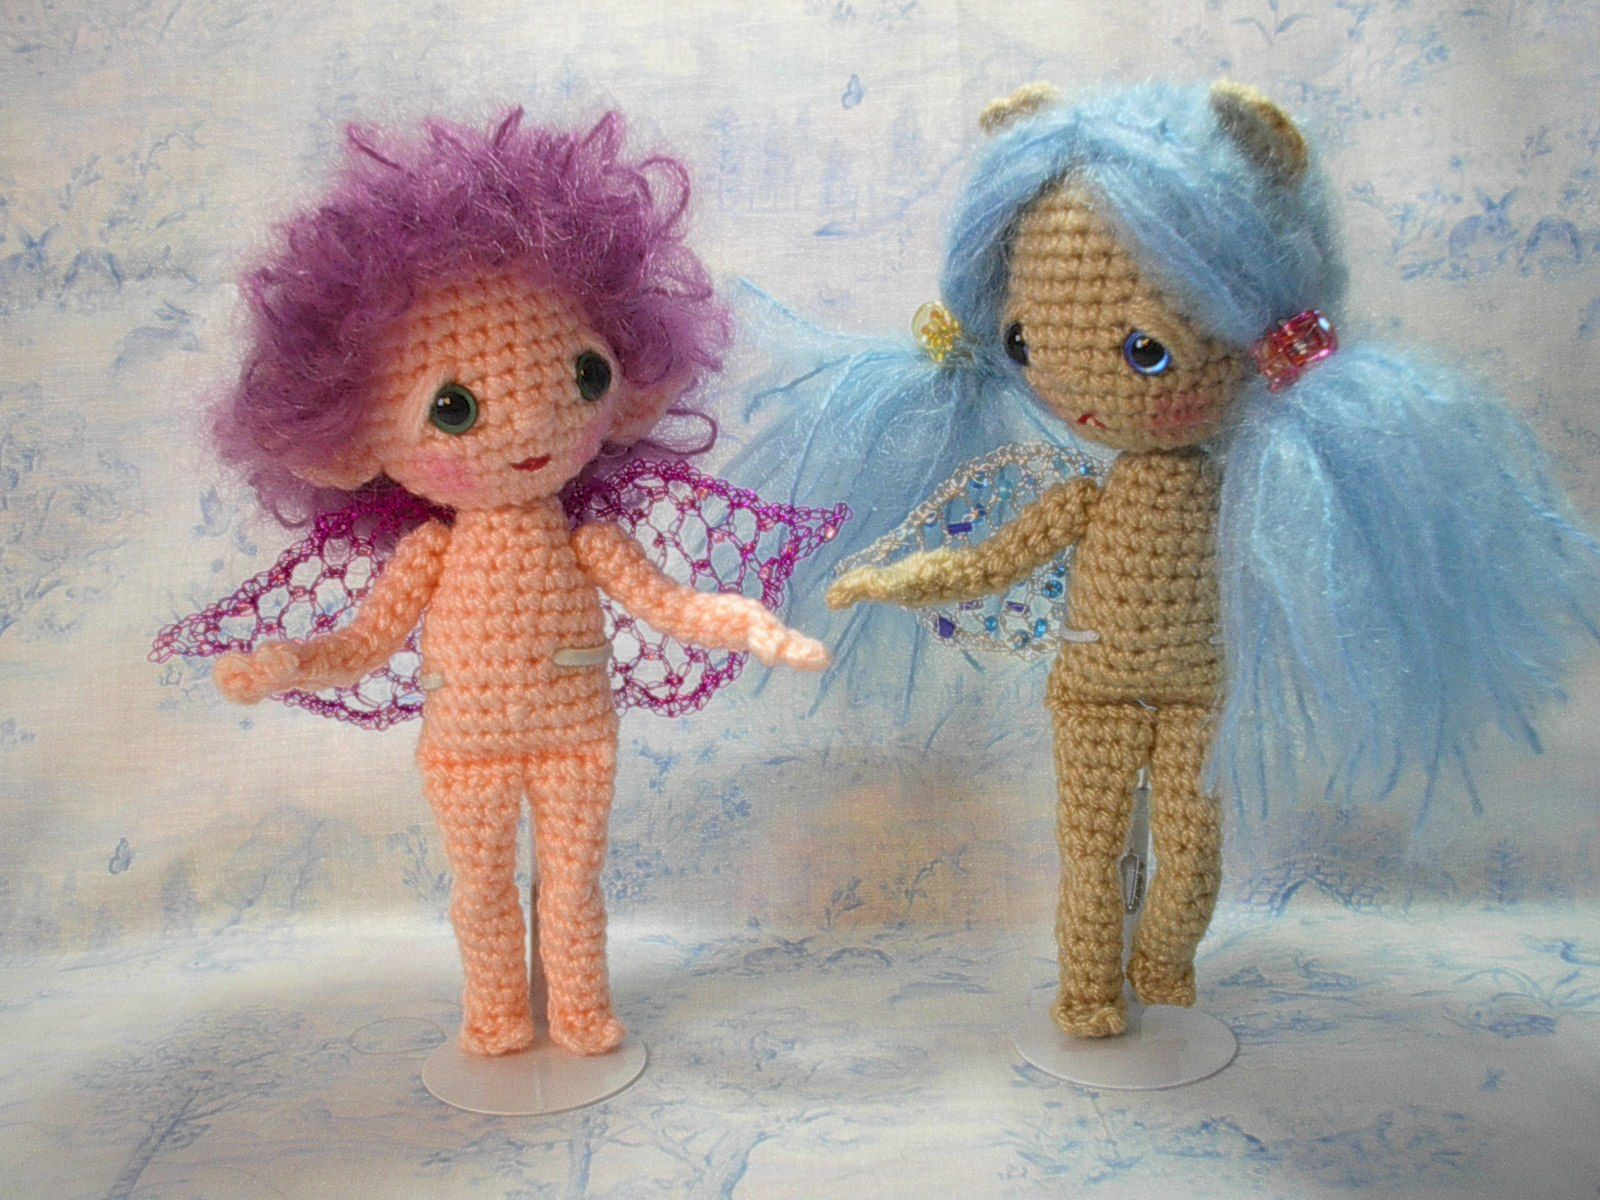 Amigurumi Doll Lalaloopsy Pattern : Free spirit amigurumi doll ☺ free pattern ☺ this site is just